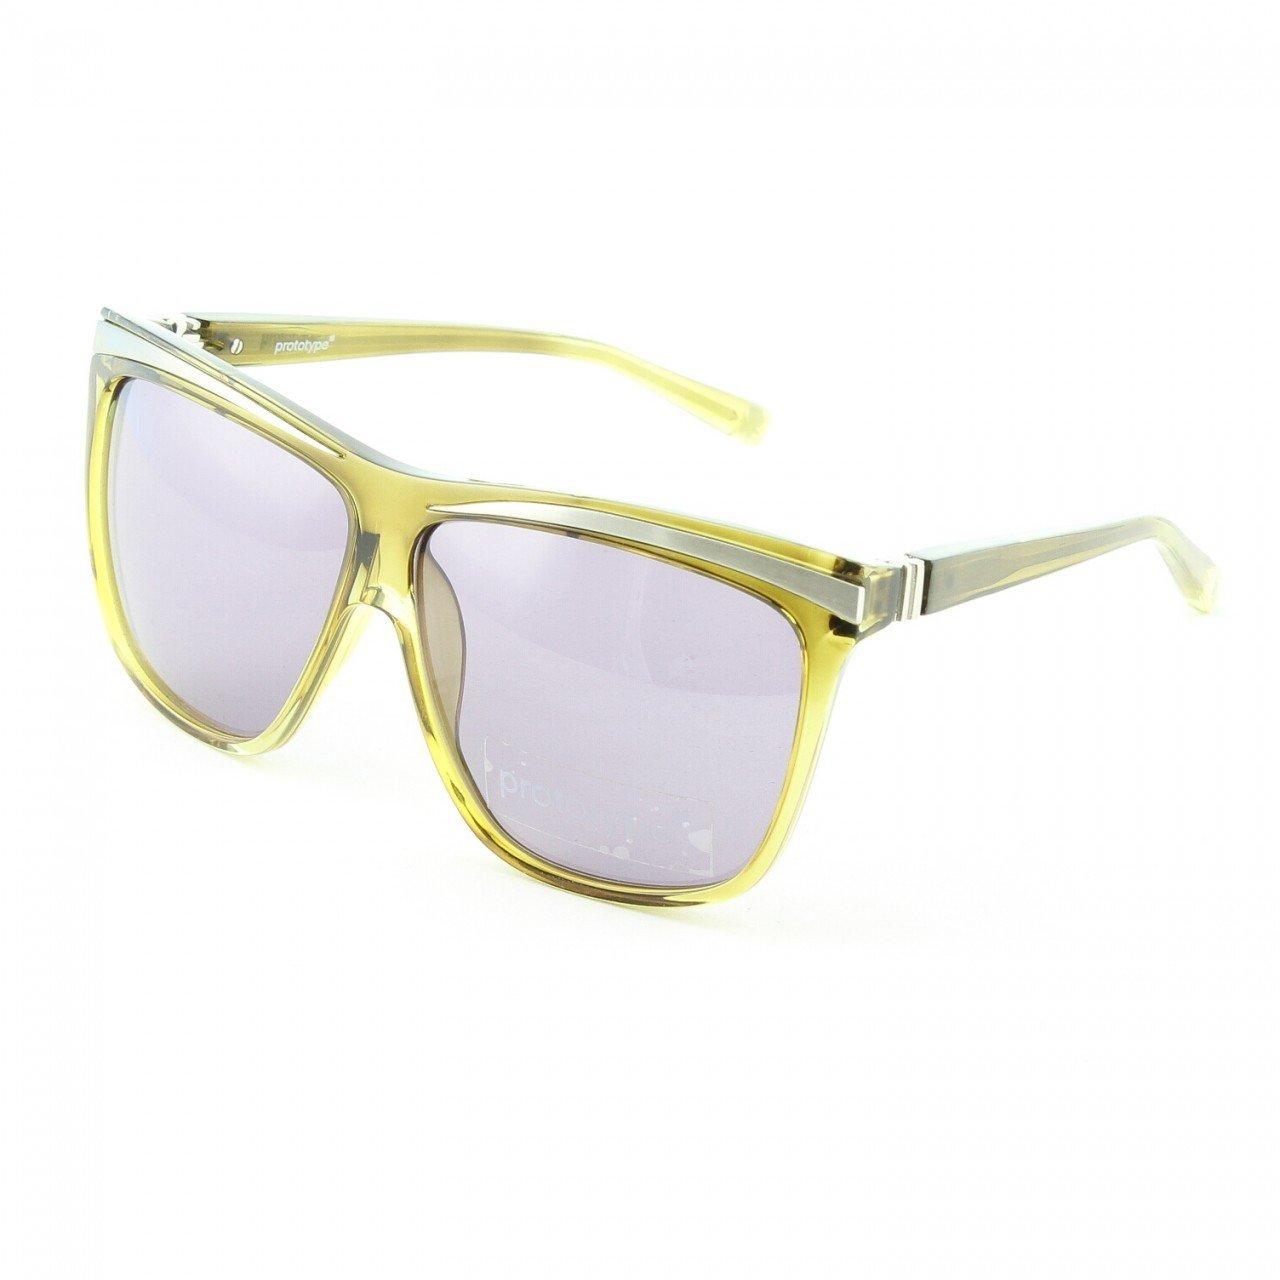 Prototype byYohji Yamamoto 017 Fang Sunglasses Col. 02 Green & Silver with Purple Lenses